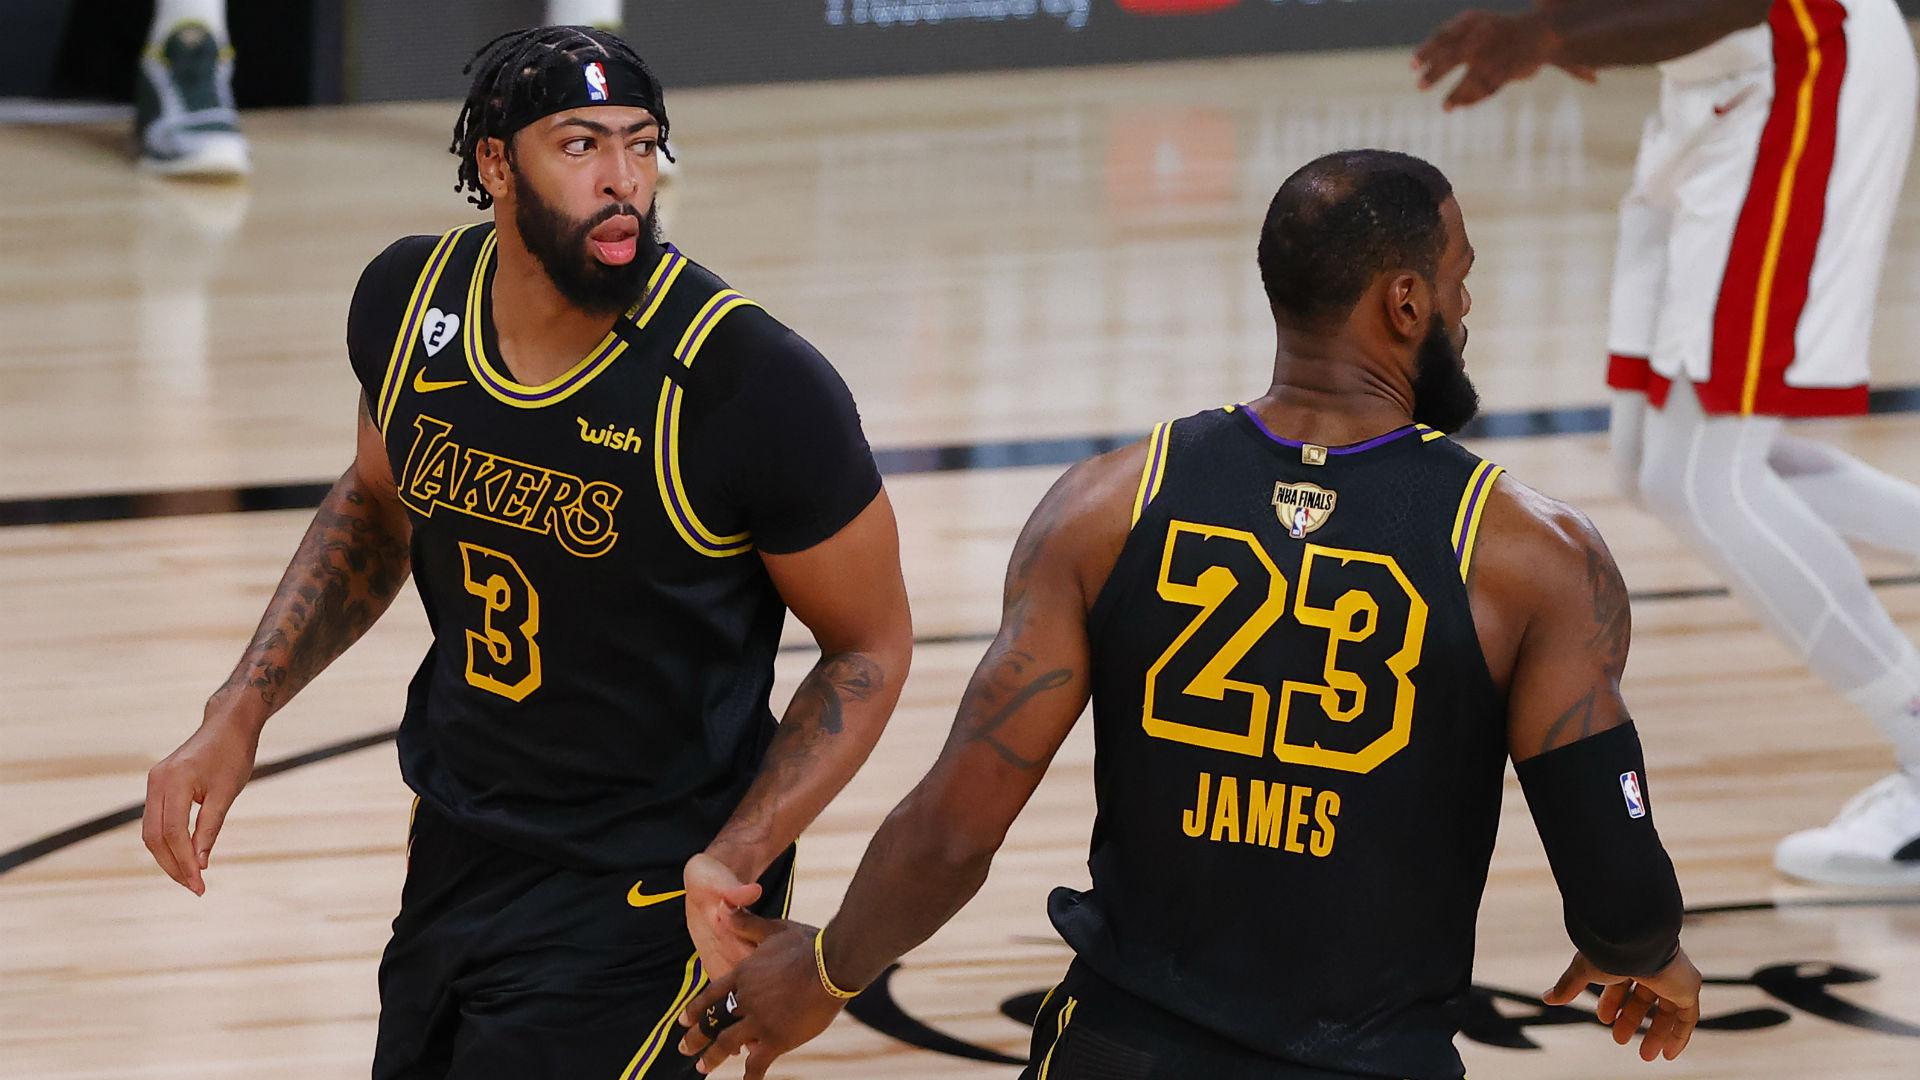 Lakers vs. Heat score, results: LeBron James, Anthony Davis power LA past Miami in Game 2